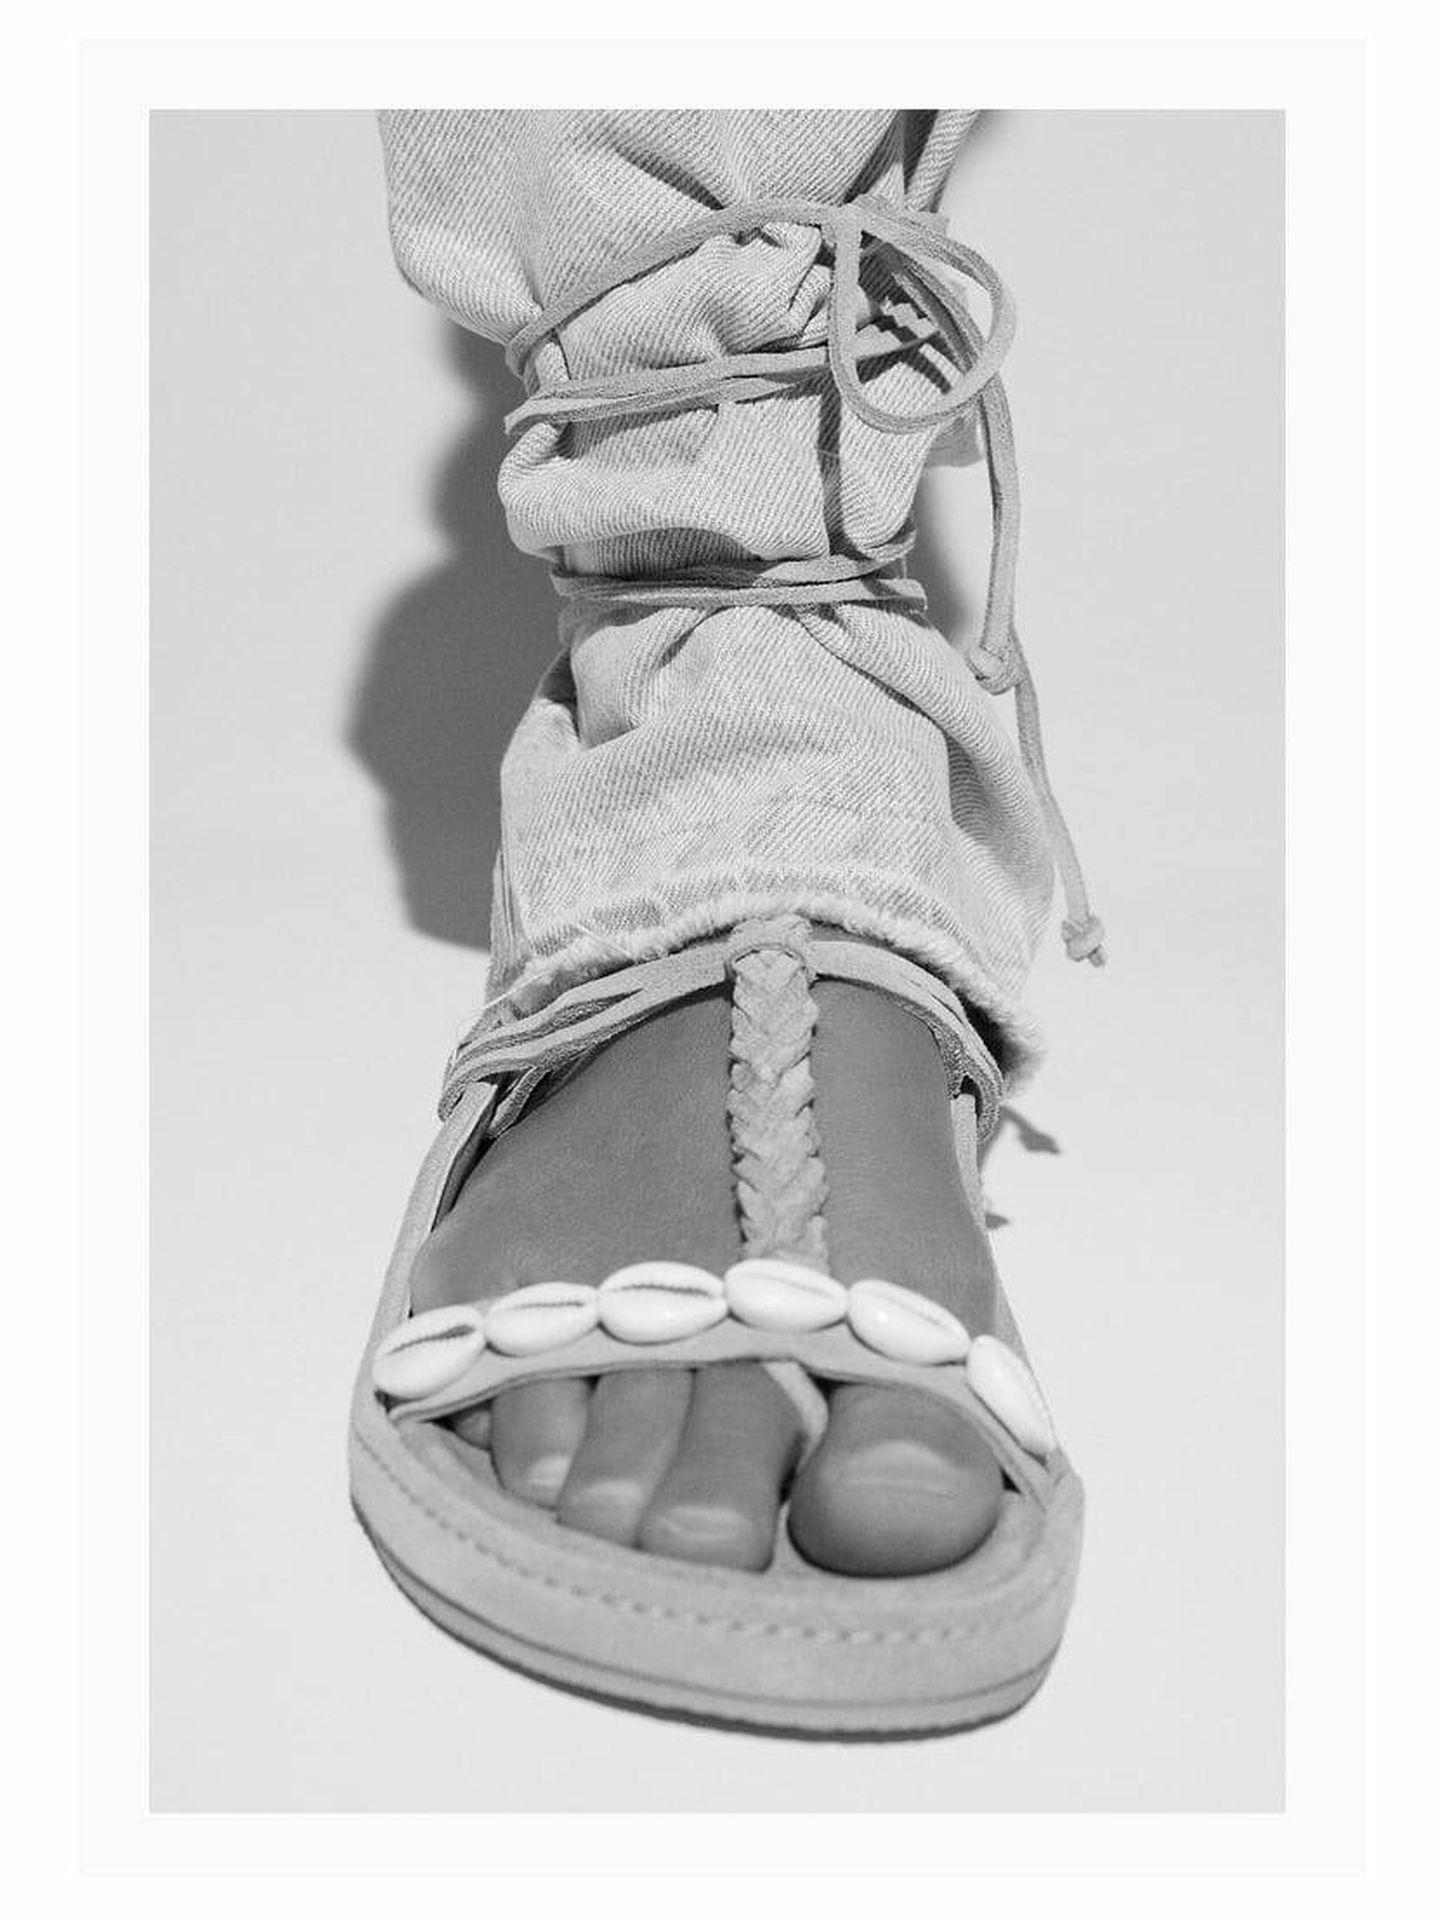 Sandalias de Zara con conchas marinas. (Cortesía)